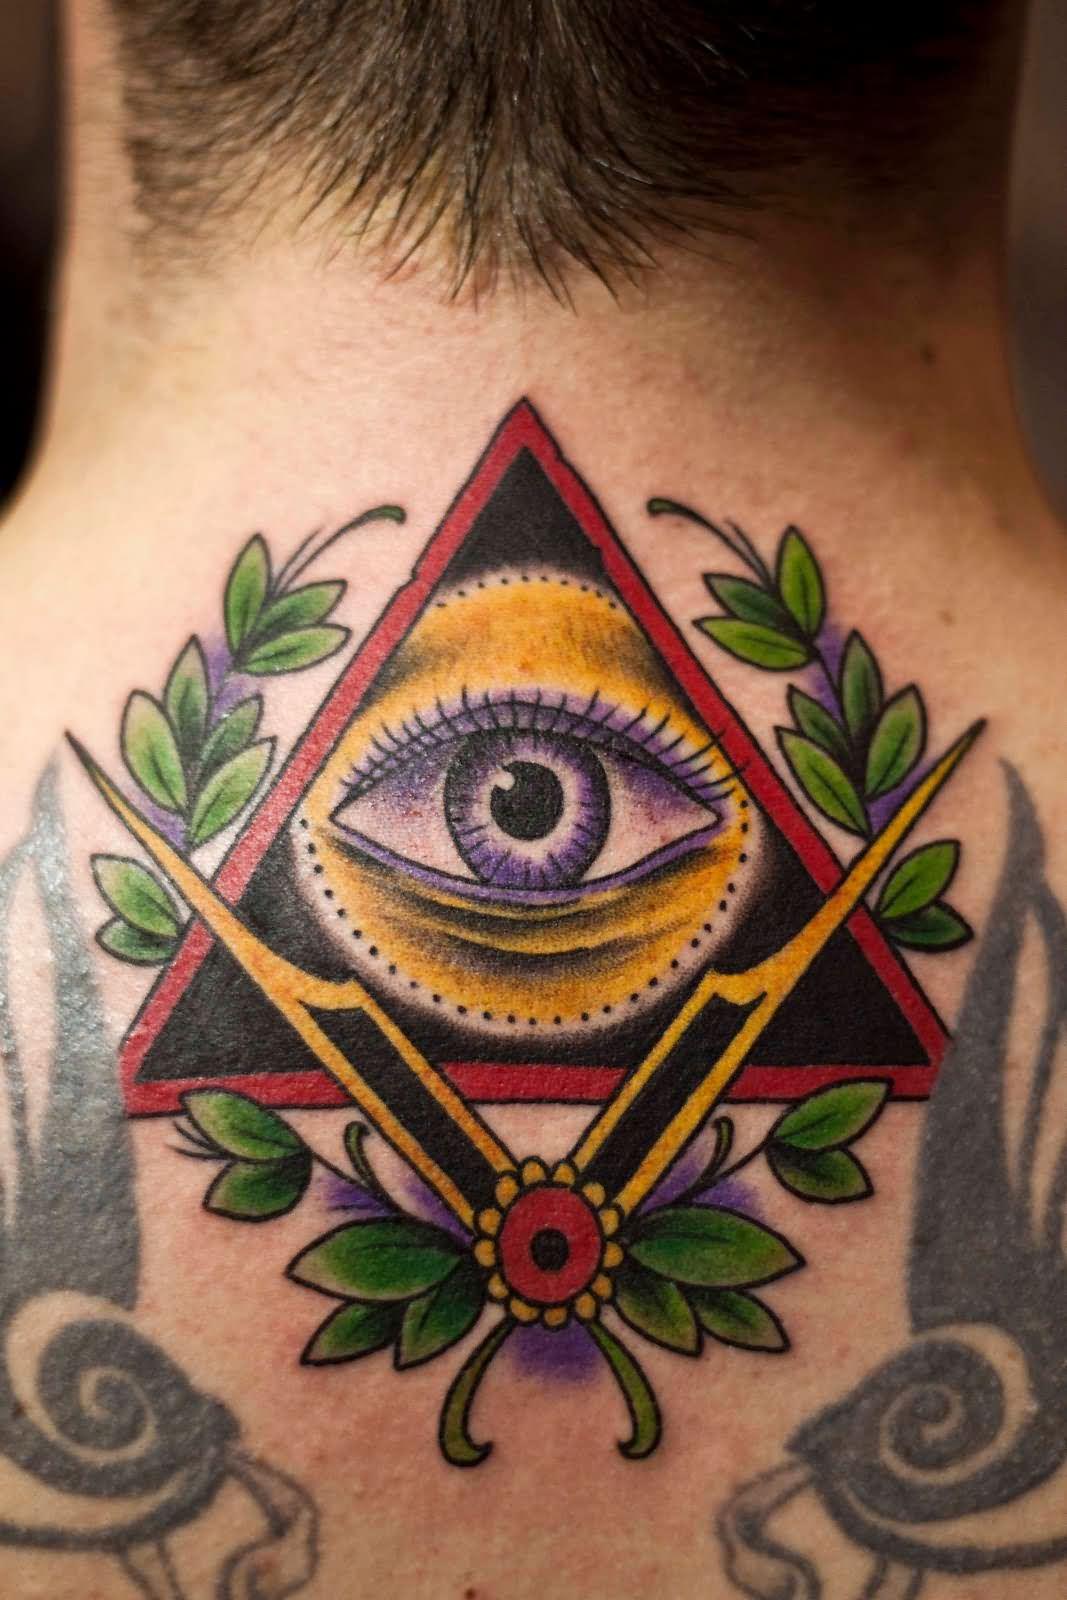 Глаз на пирамиде тату означает